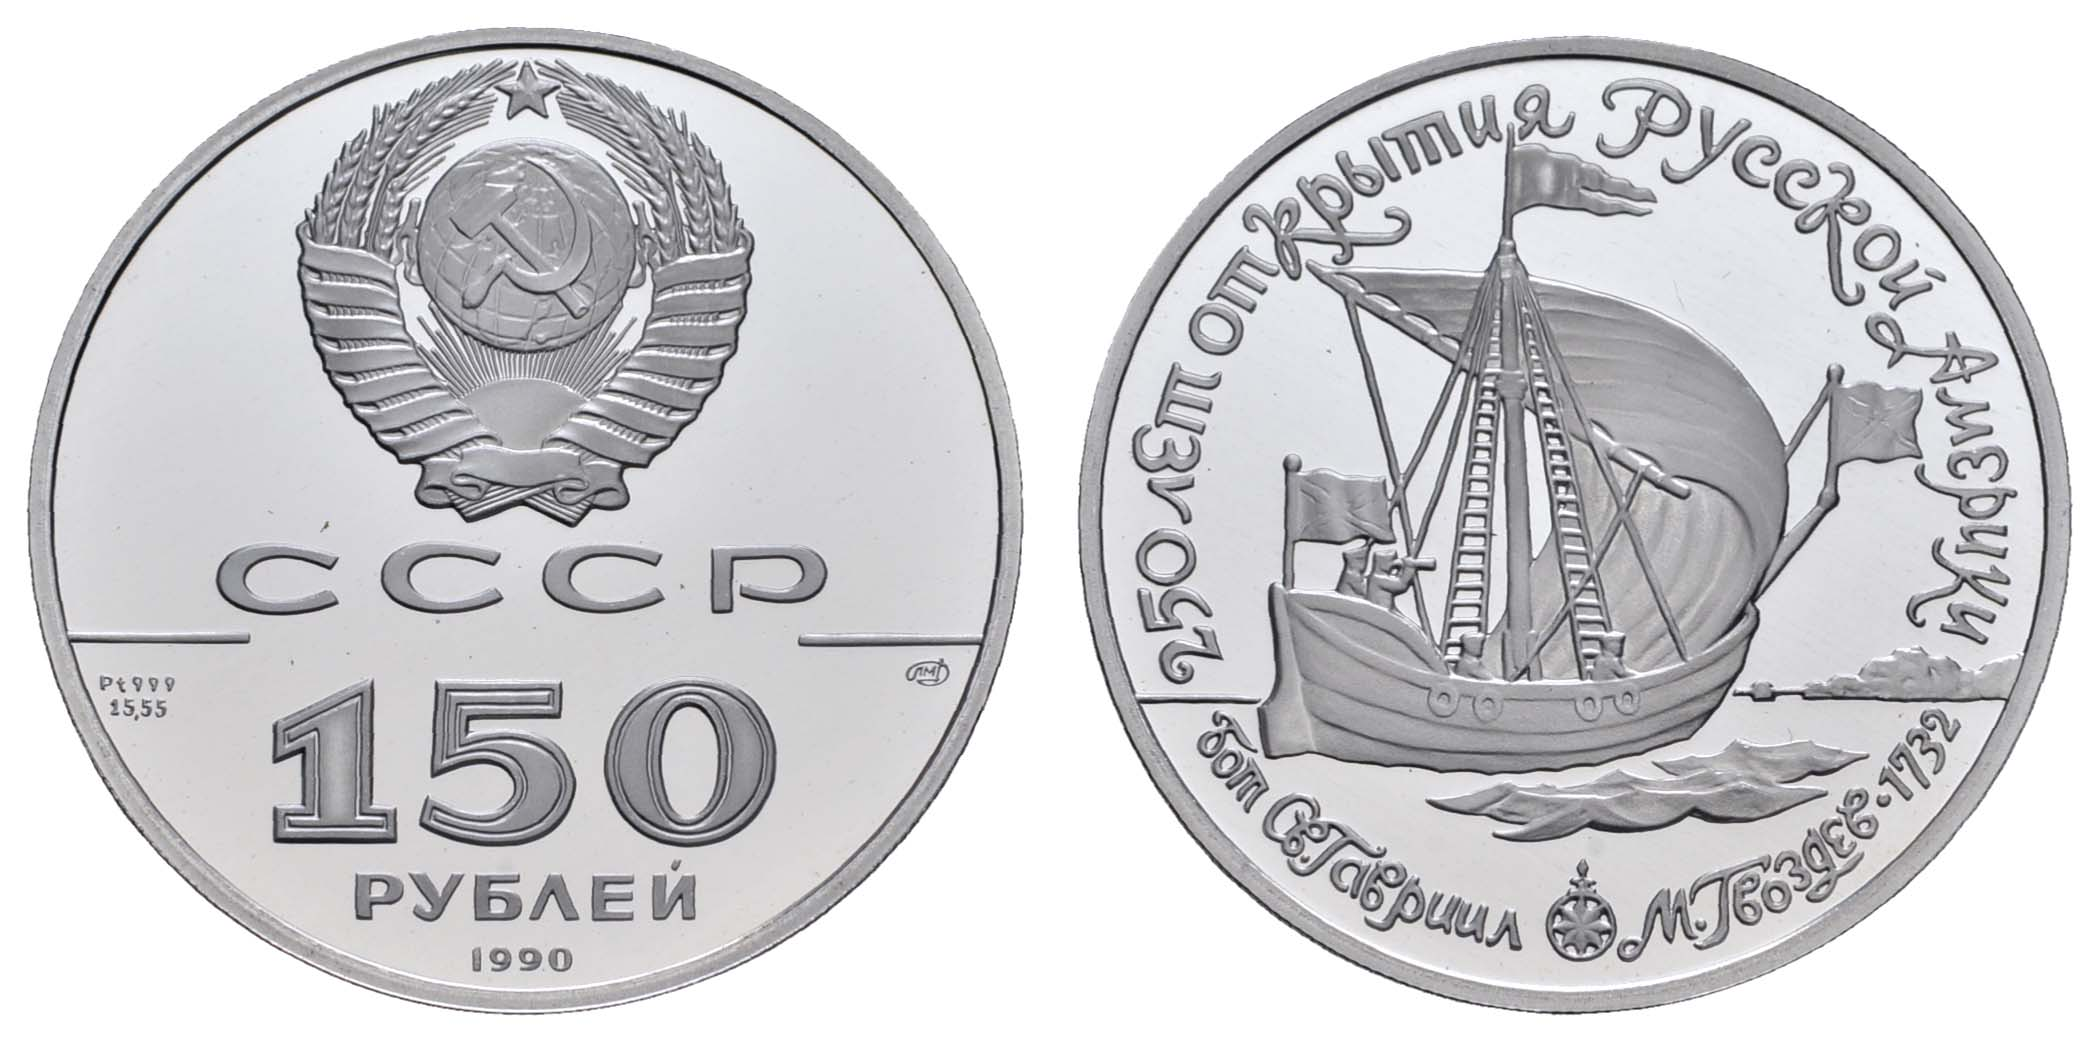 Lot 1772 - europa ab 1800 - Russland -  Auktionshaus Ulrich Felzmann GmbH & Co. KG Coins single lots